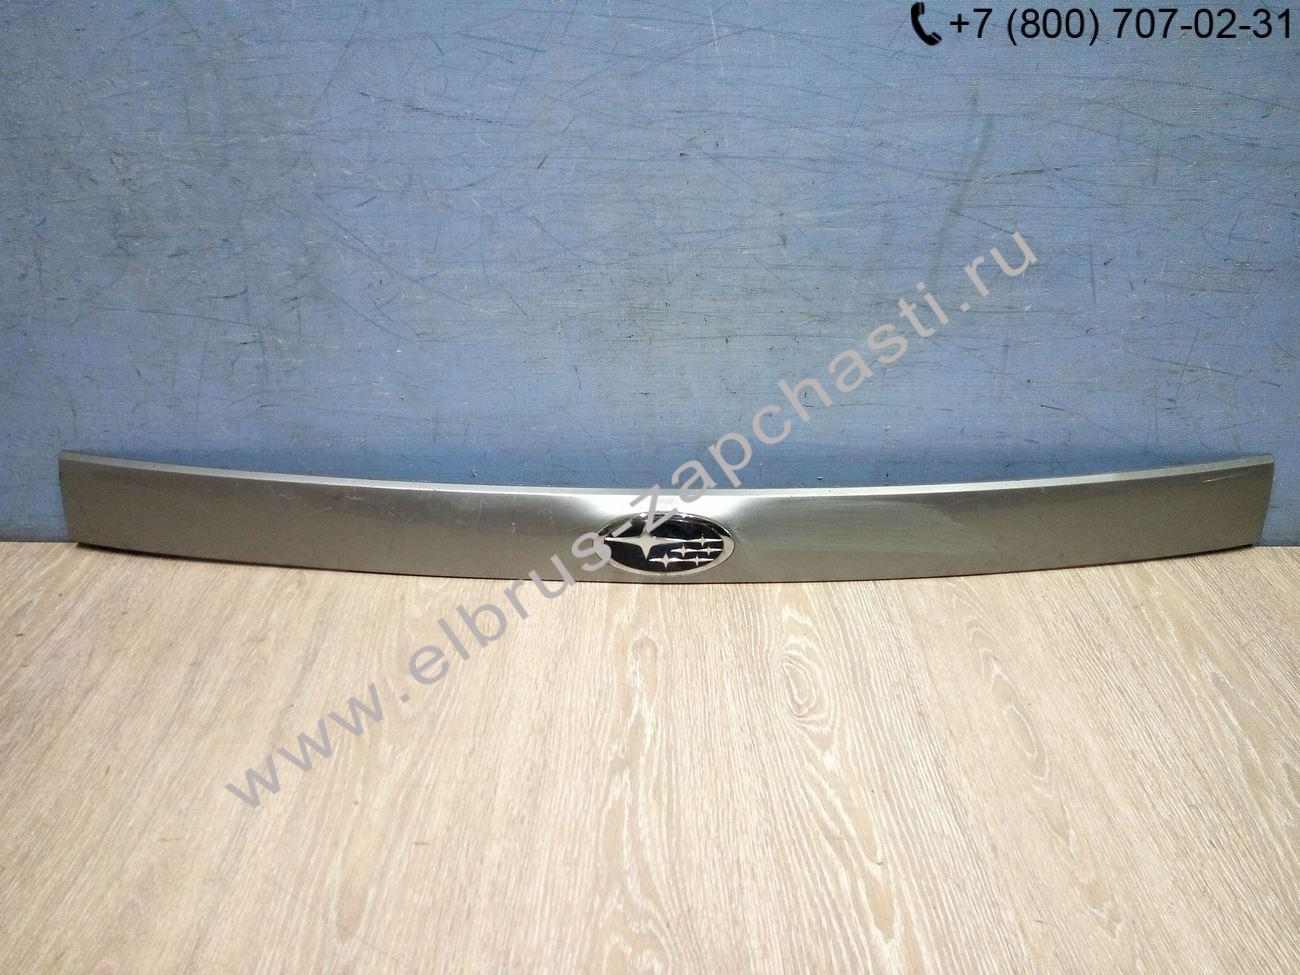 Накладка двери багажника Subaru Forester 3 (2007-2013) 91119SC000NN (MW-001047711006032017) Фотография